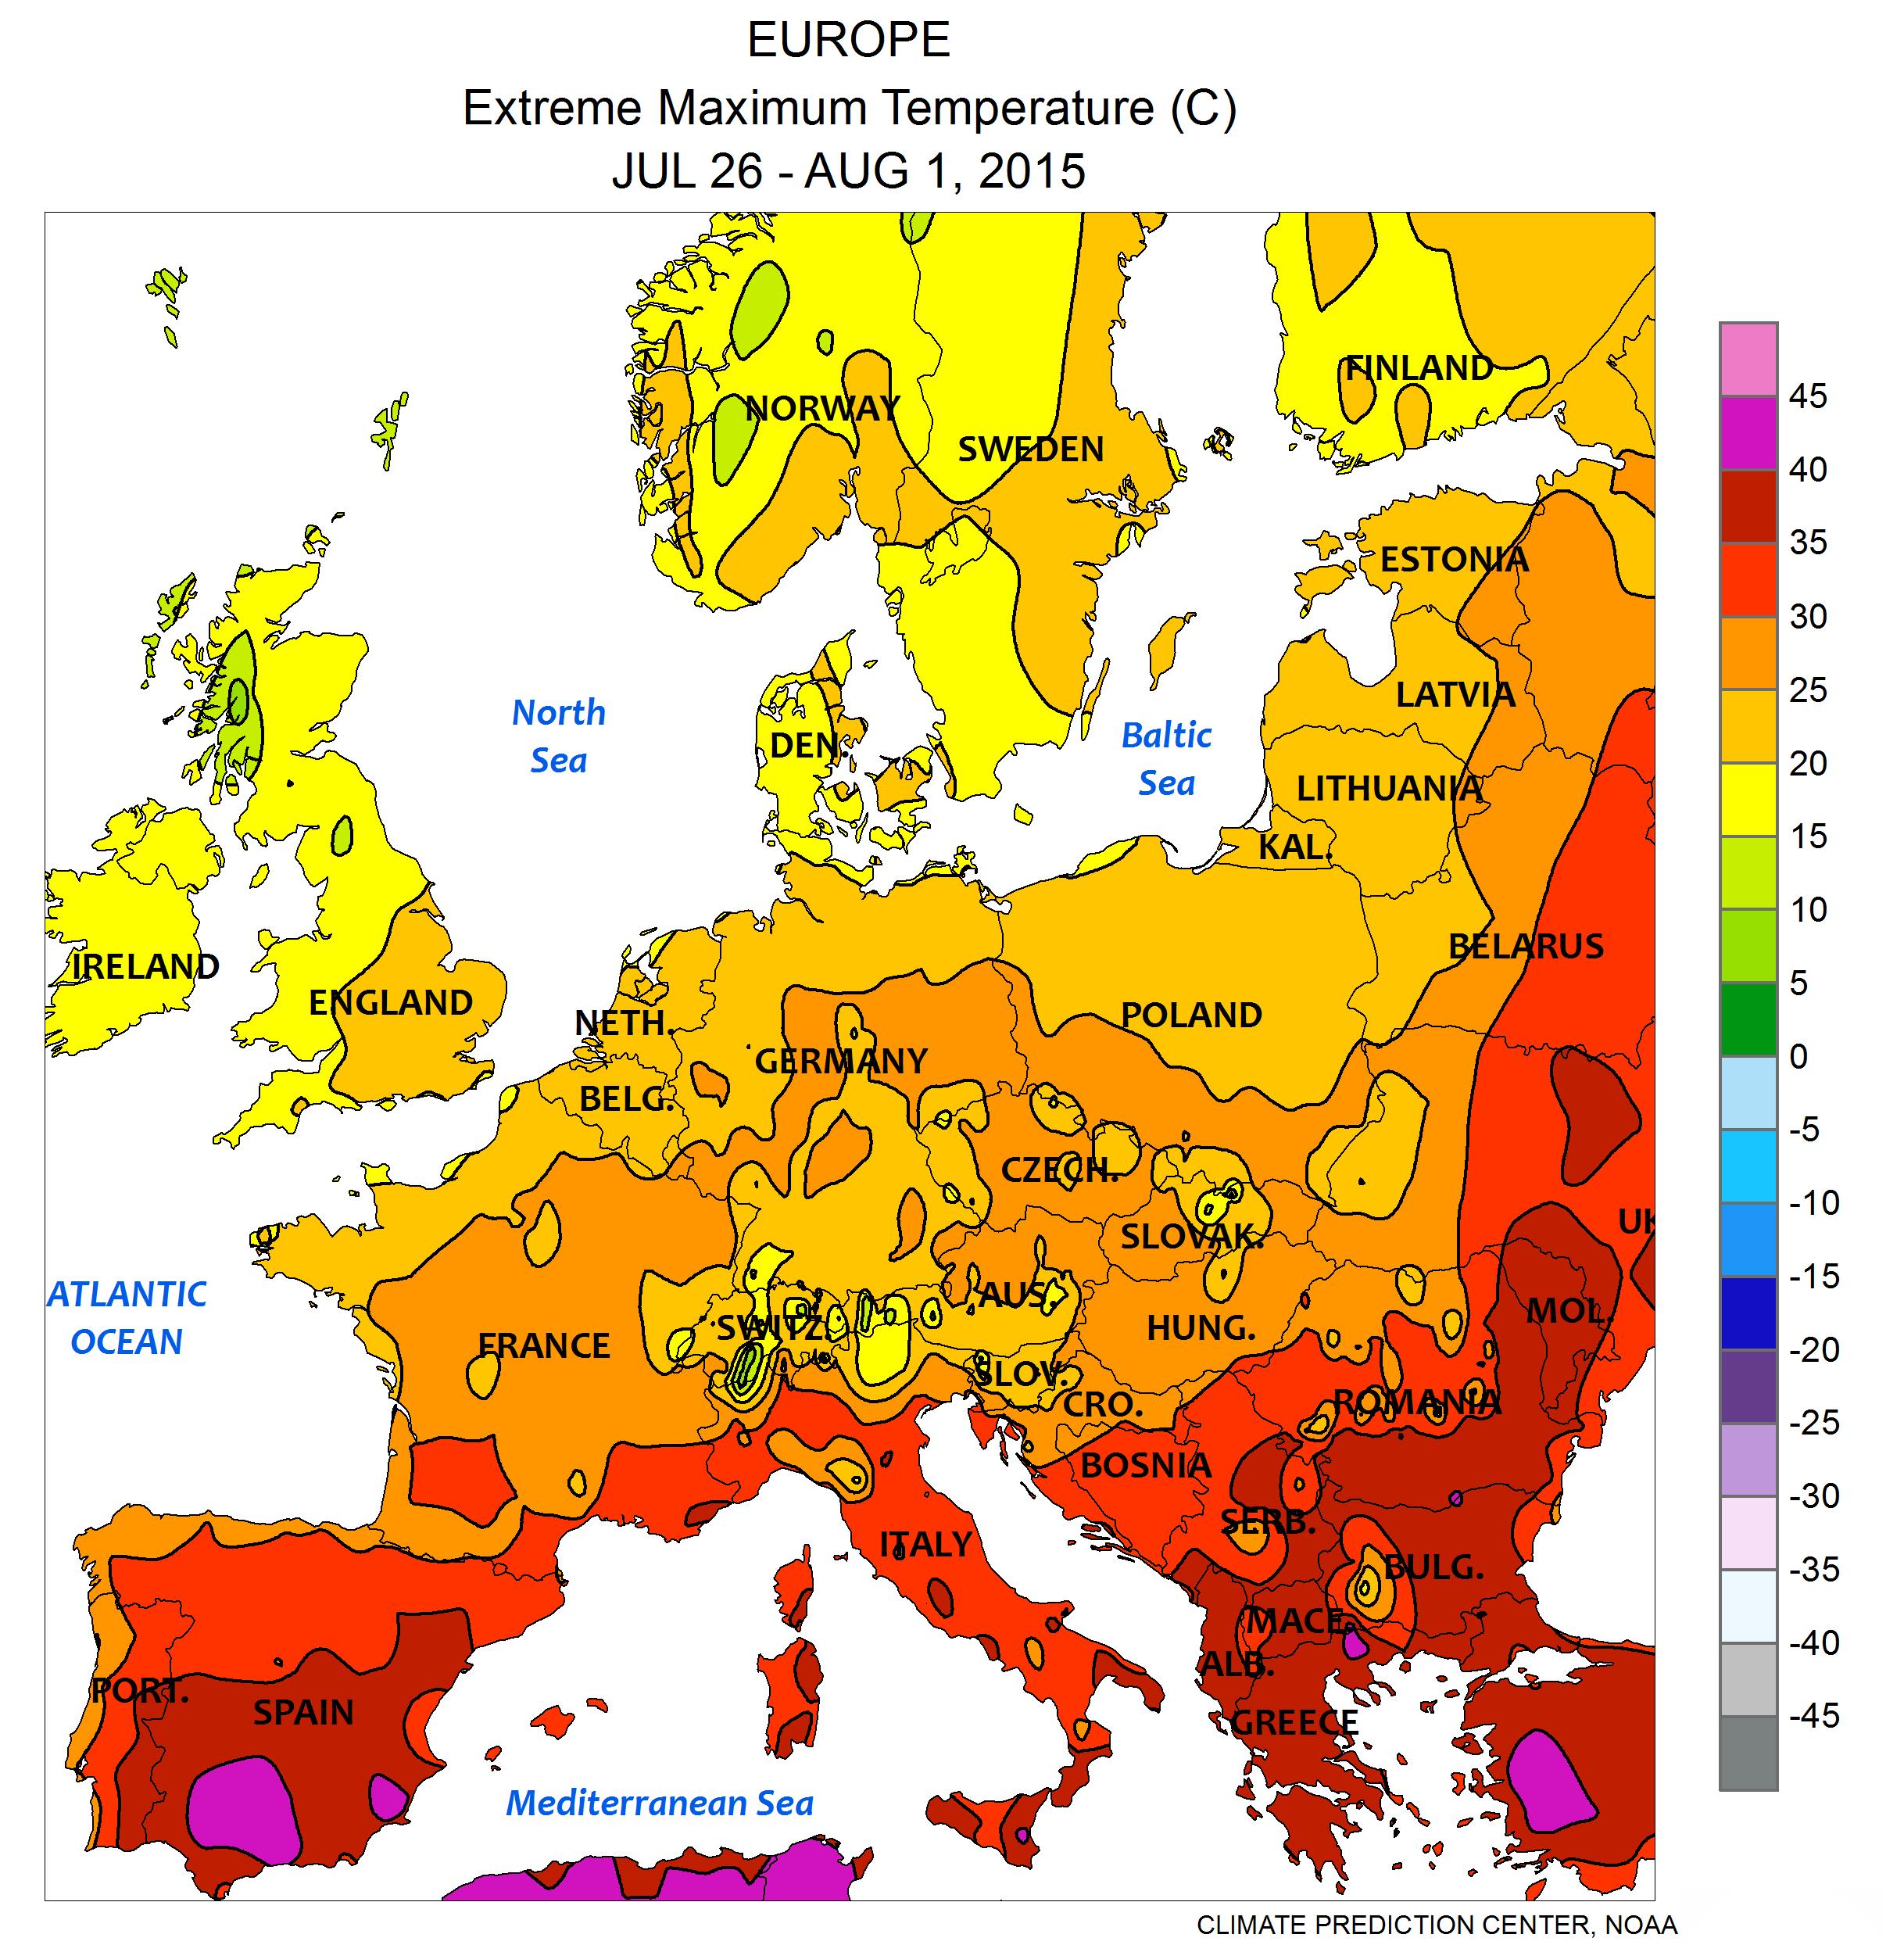 temperaturer i europa i juli